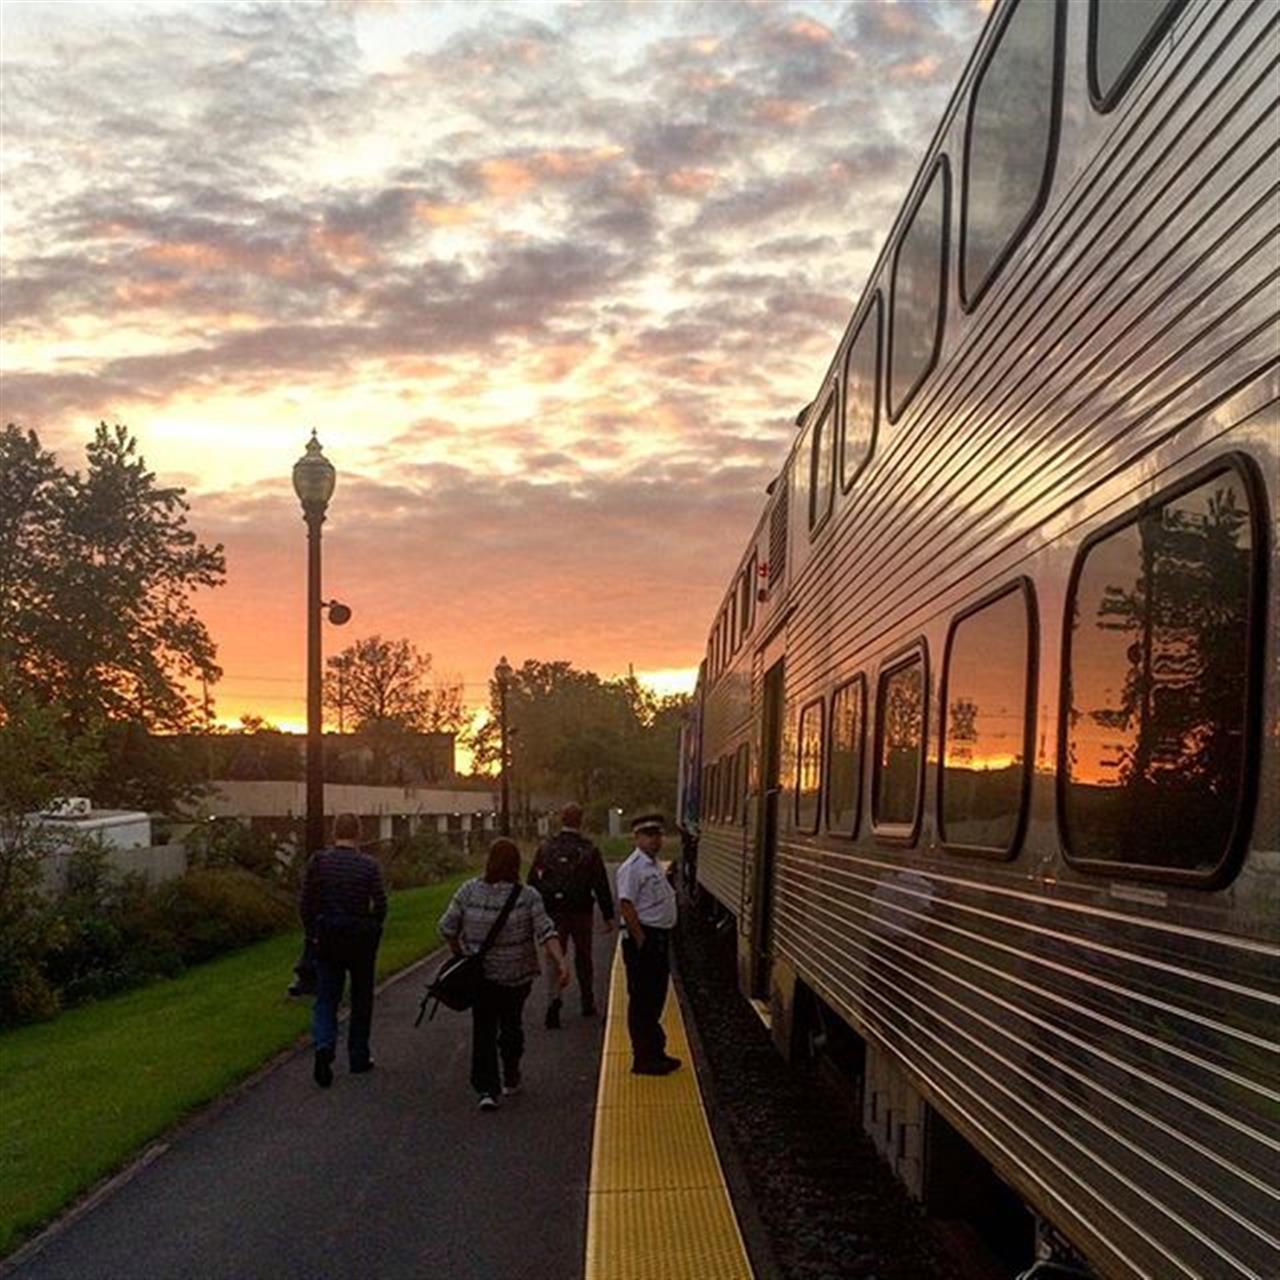 Beautiful sunsets make commutes better #chicago #leadingrelocal #metra #sunset